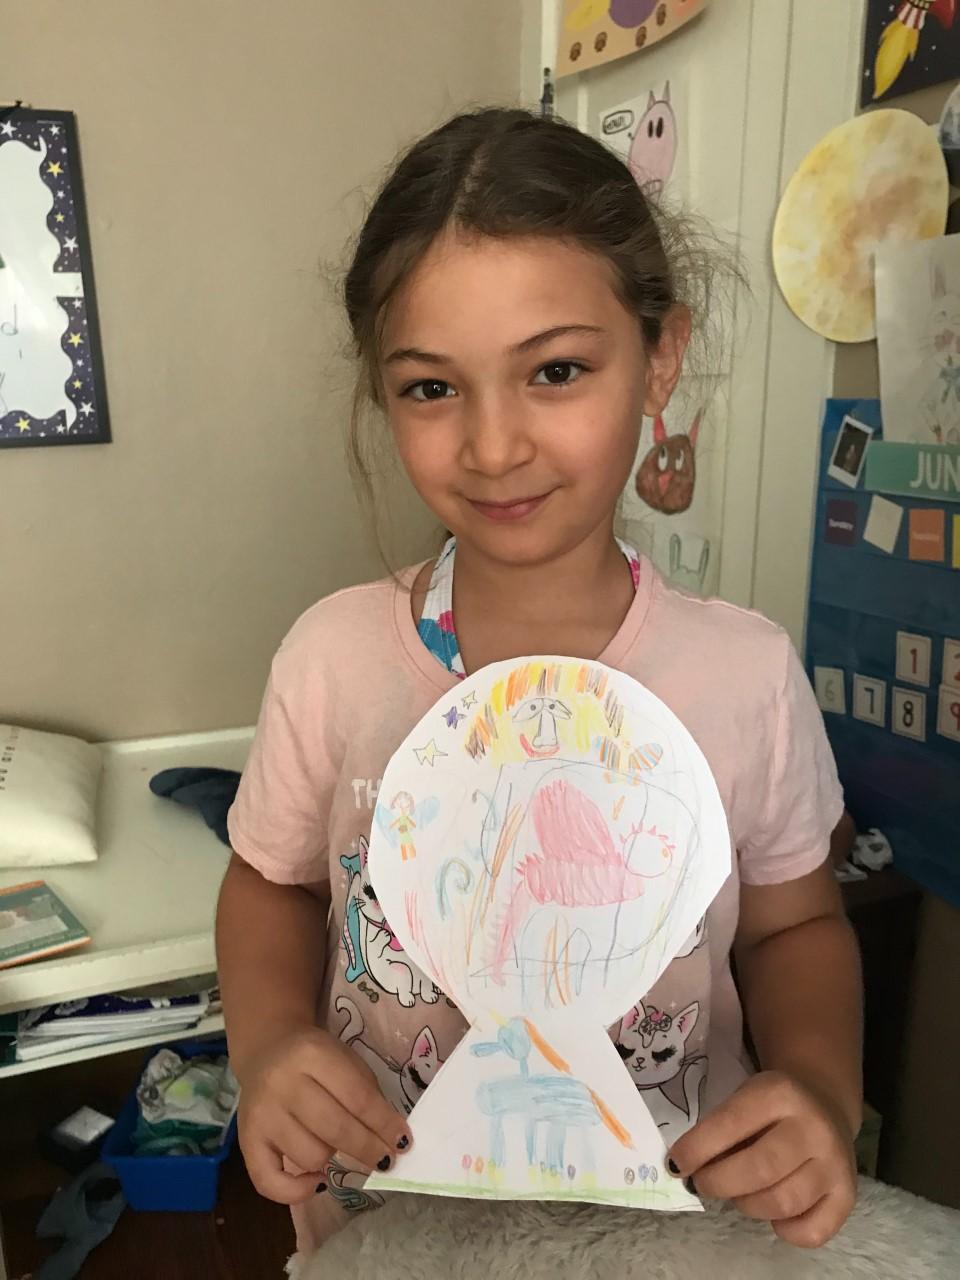 Chloe's Keyhole project